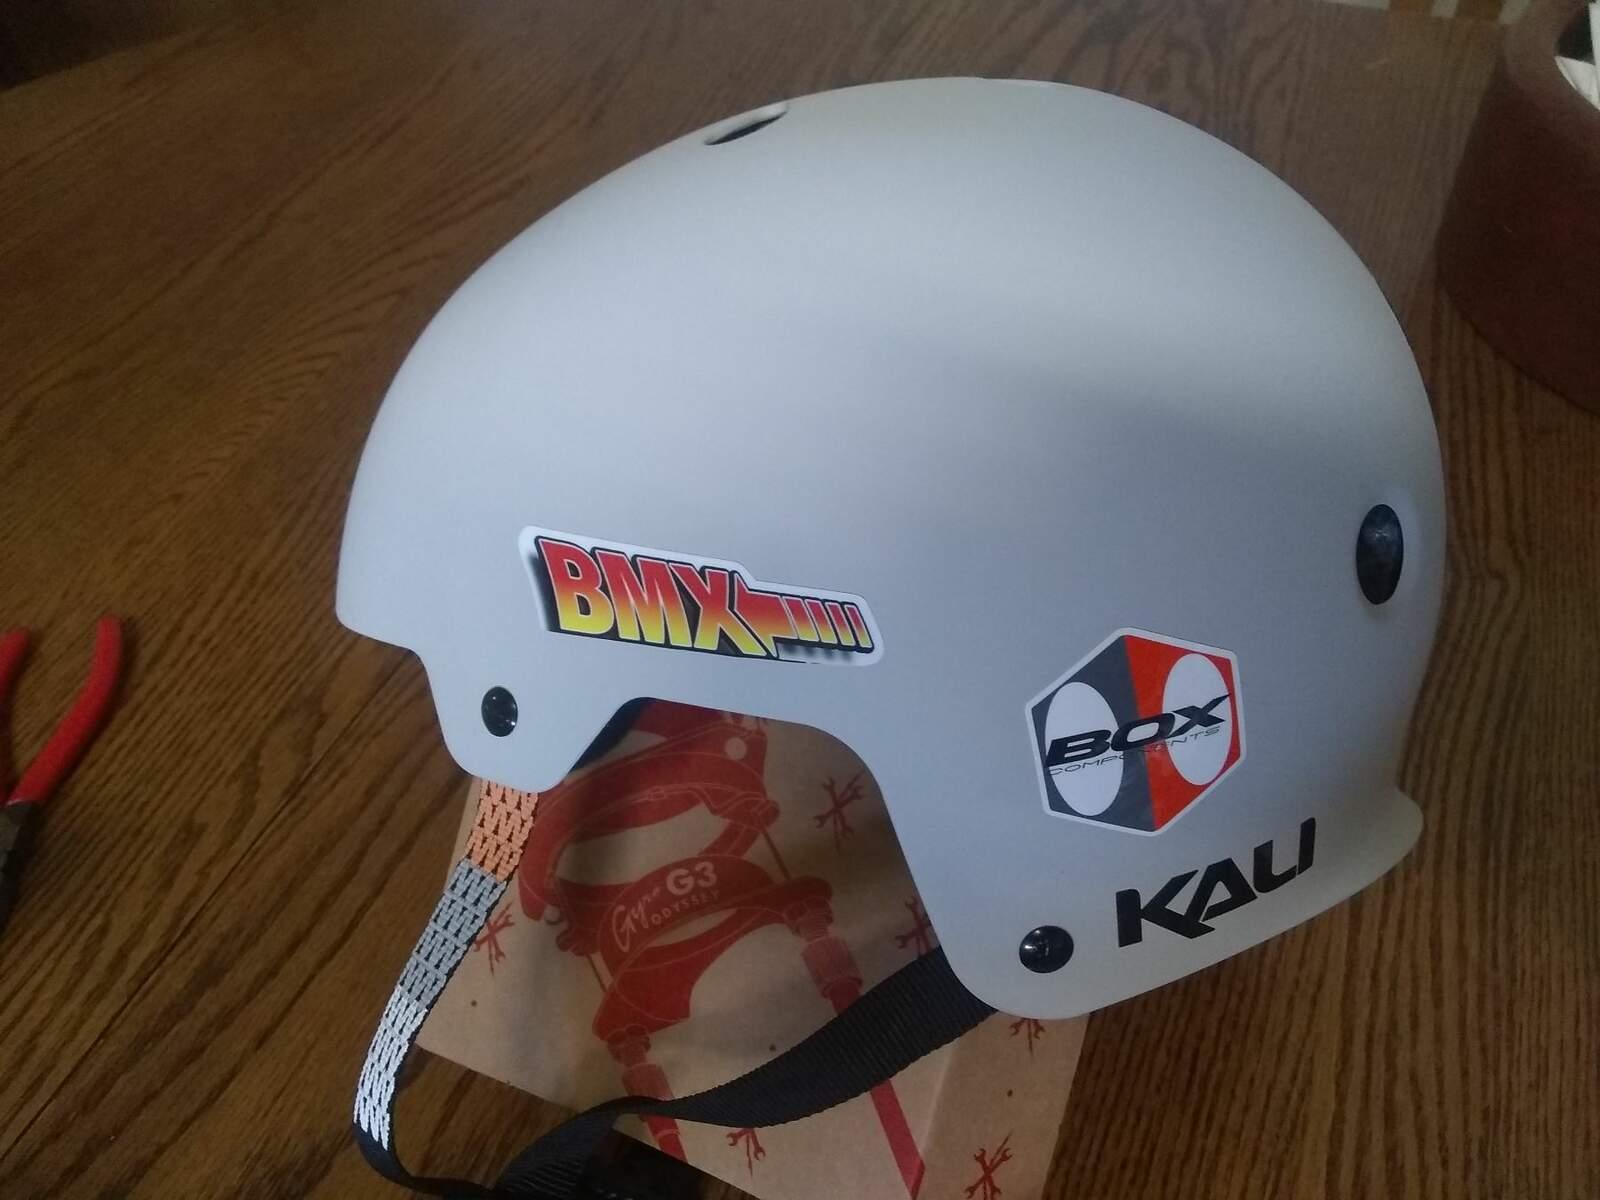 https://s3.amazonaws.com/uploads.bmxmuseum.com/user-images/278478/helmet6042b11cd5.jpg